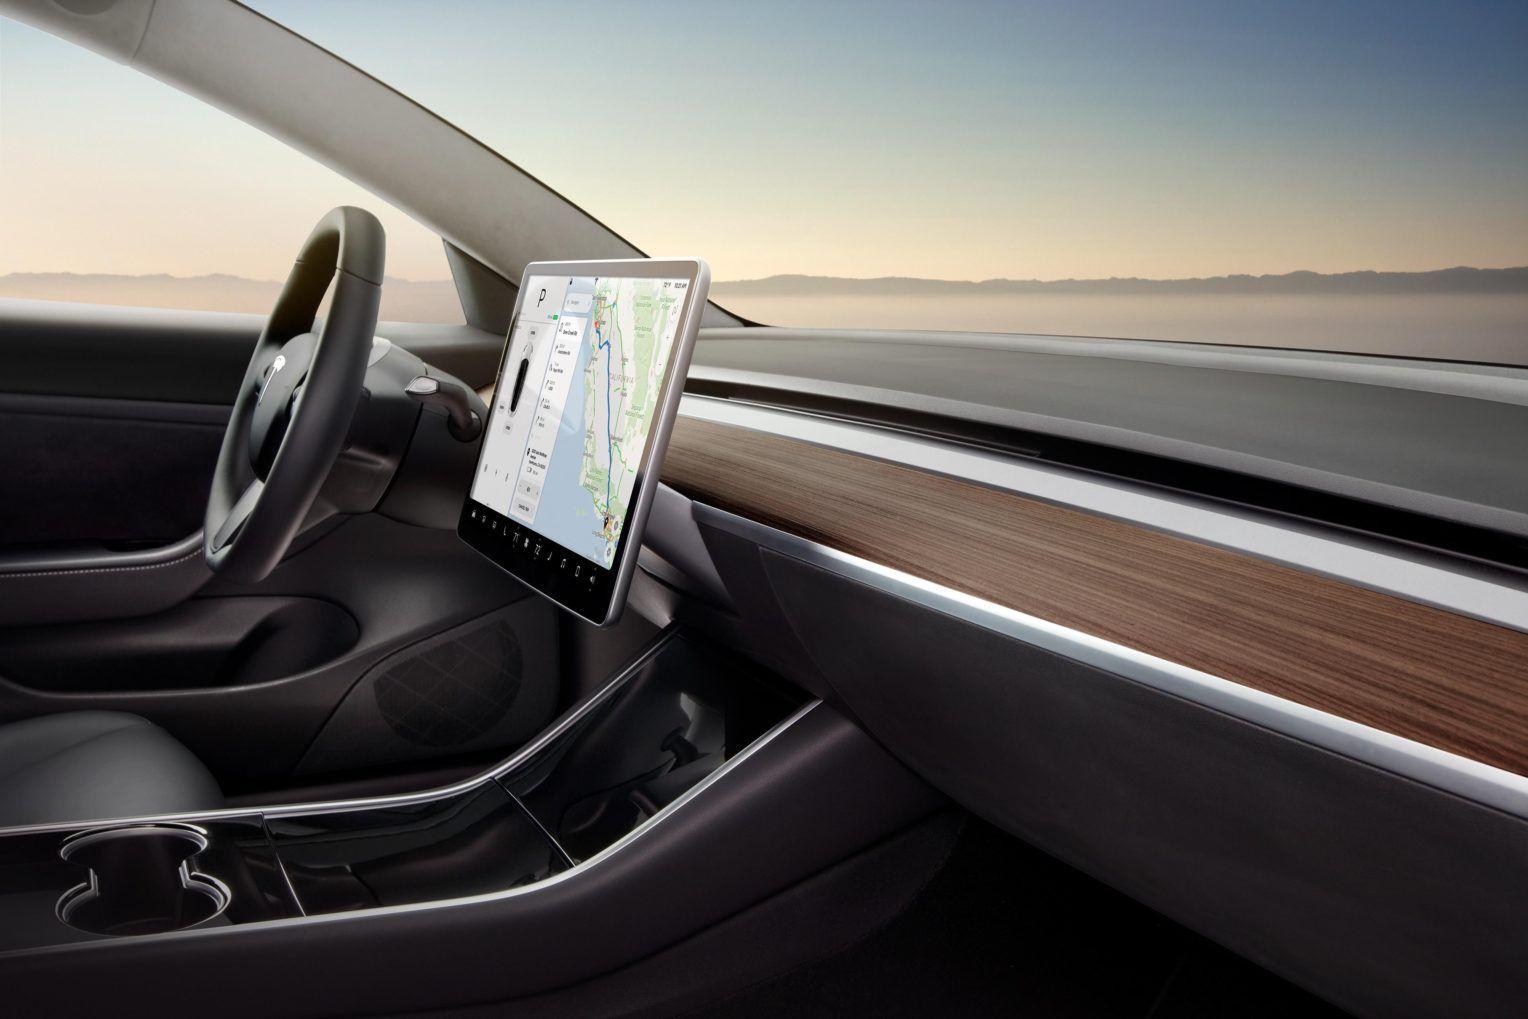 Tesla Model 3 Interior Wallpapers - Top Free Tesla Model 3 ...